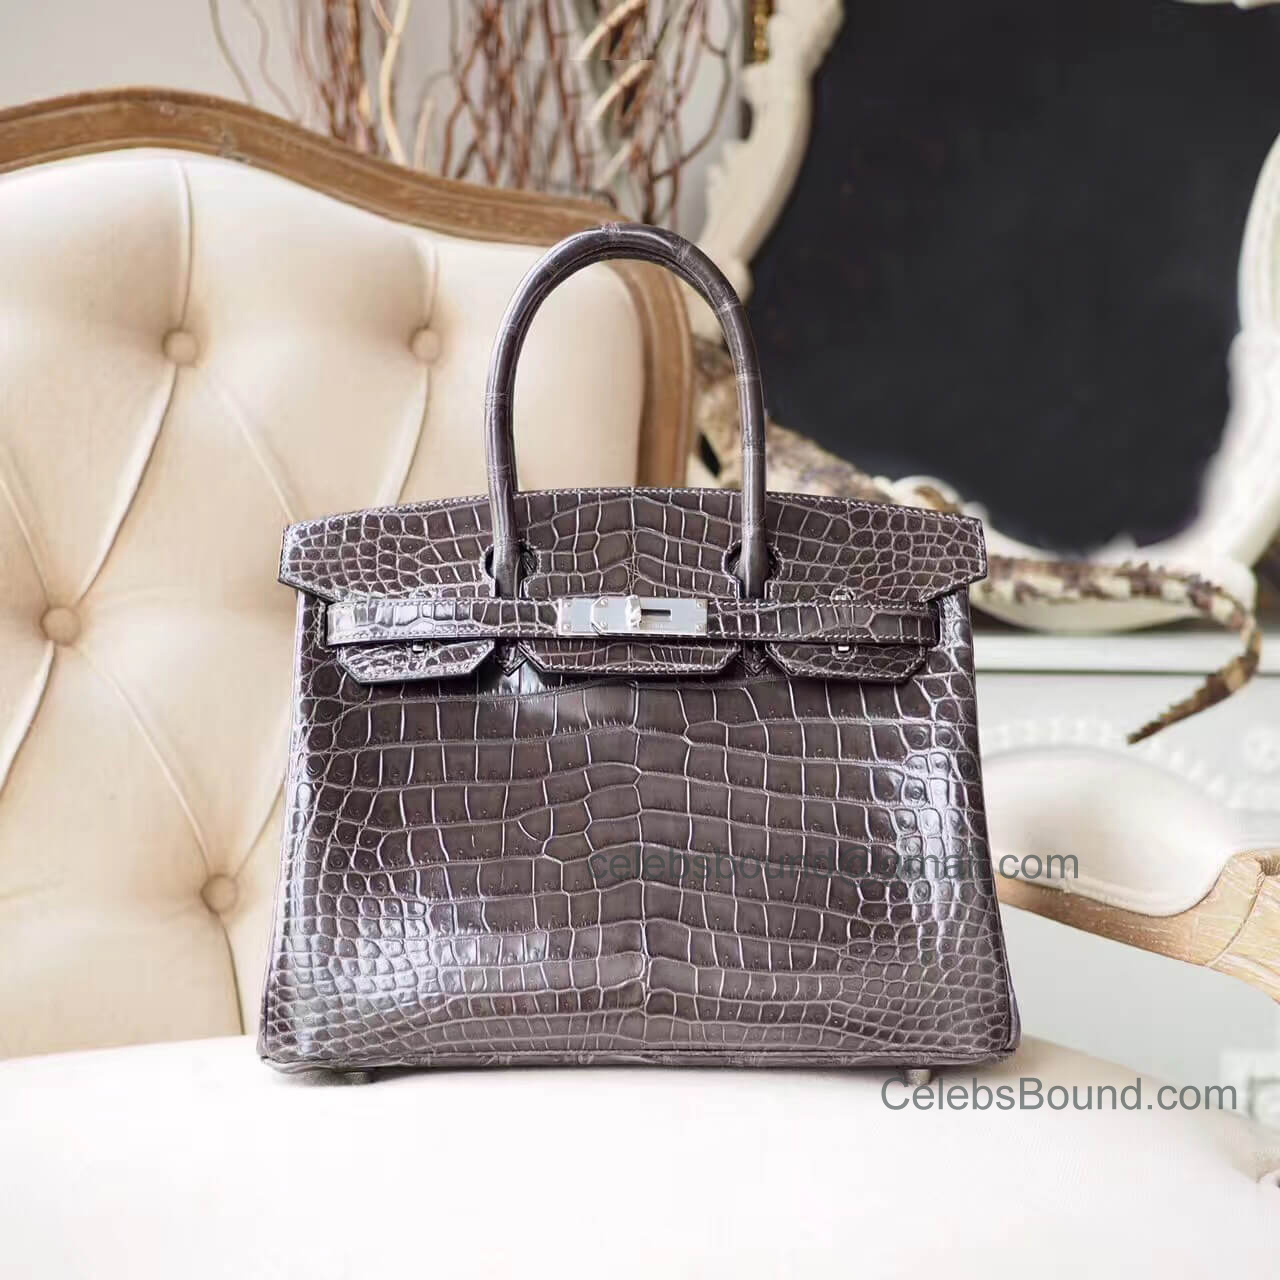 27f7b6f13b Copy Hermes Birkin 30 Bag in ck88 Graphite Shiny Porosus Croc PHW -